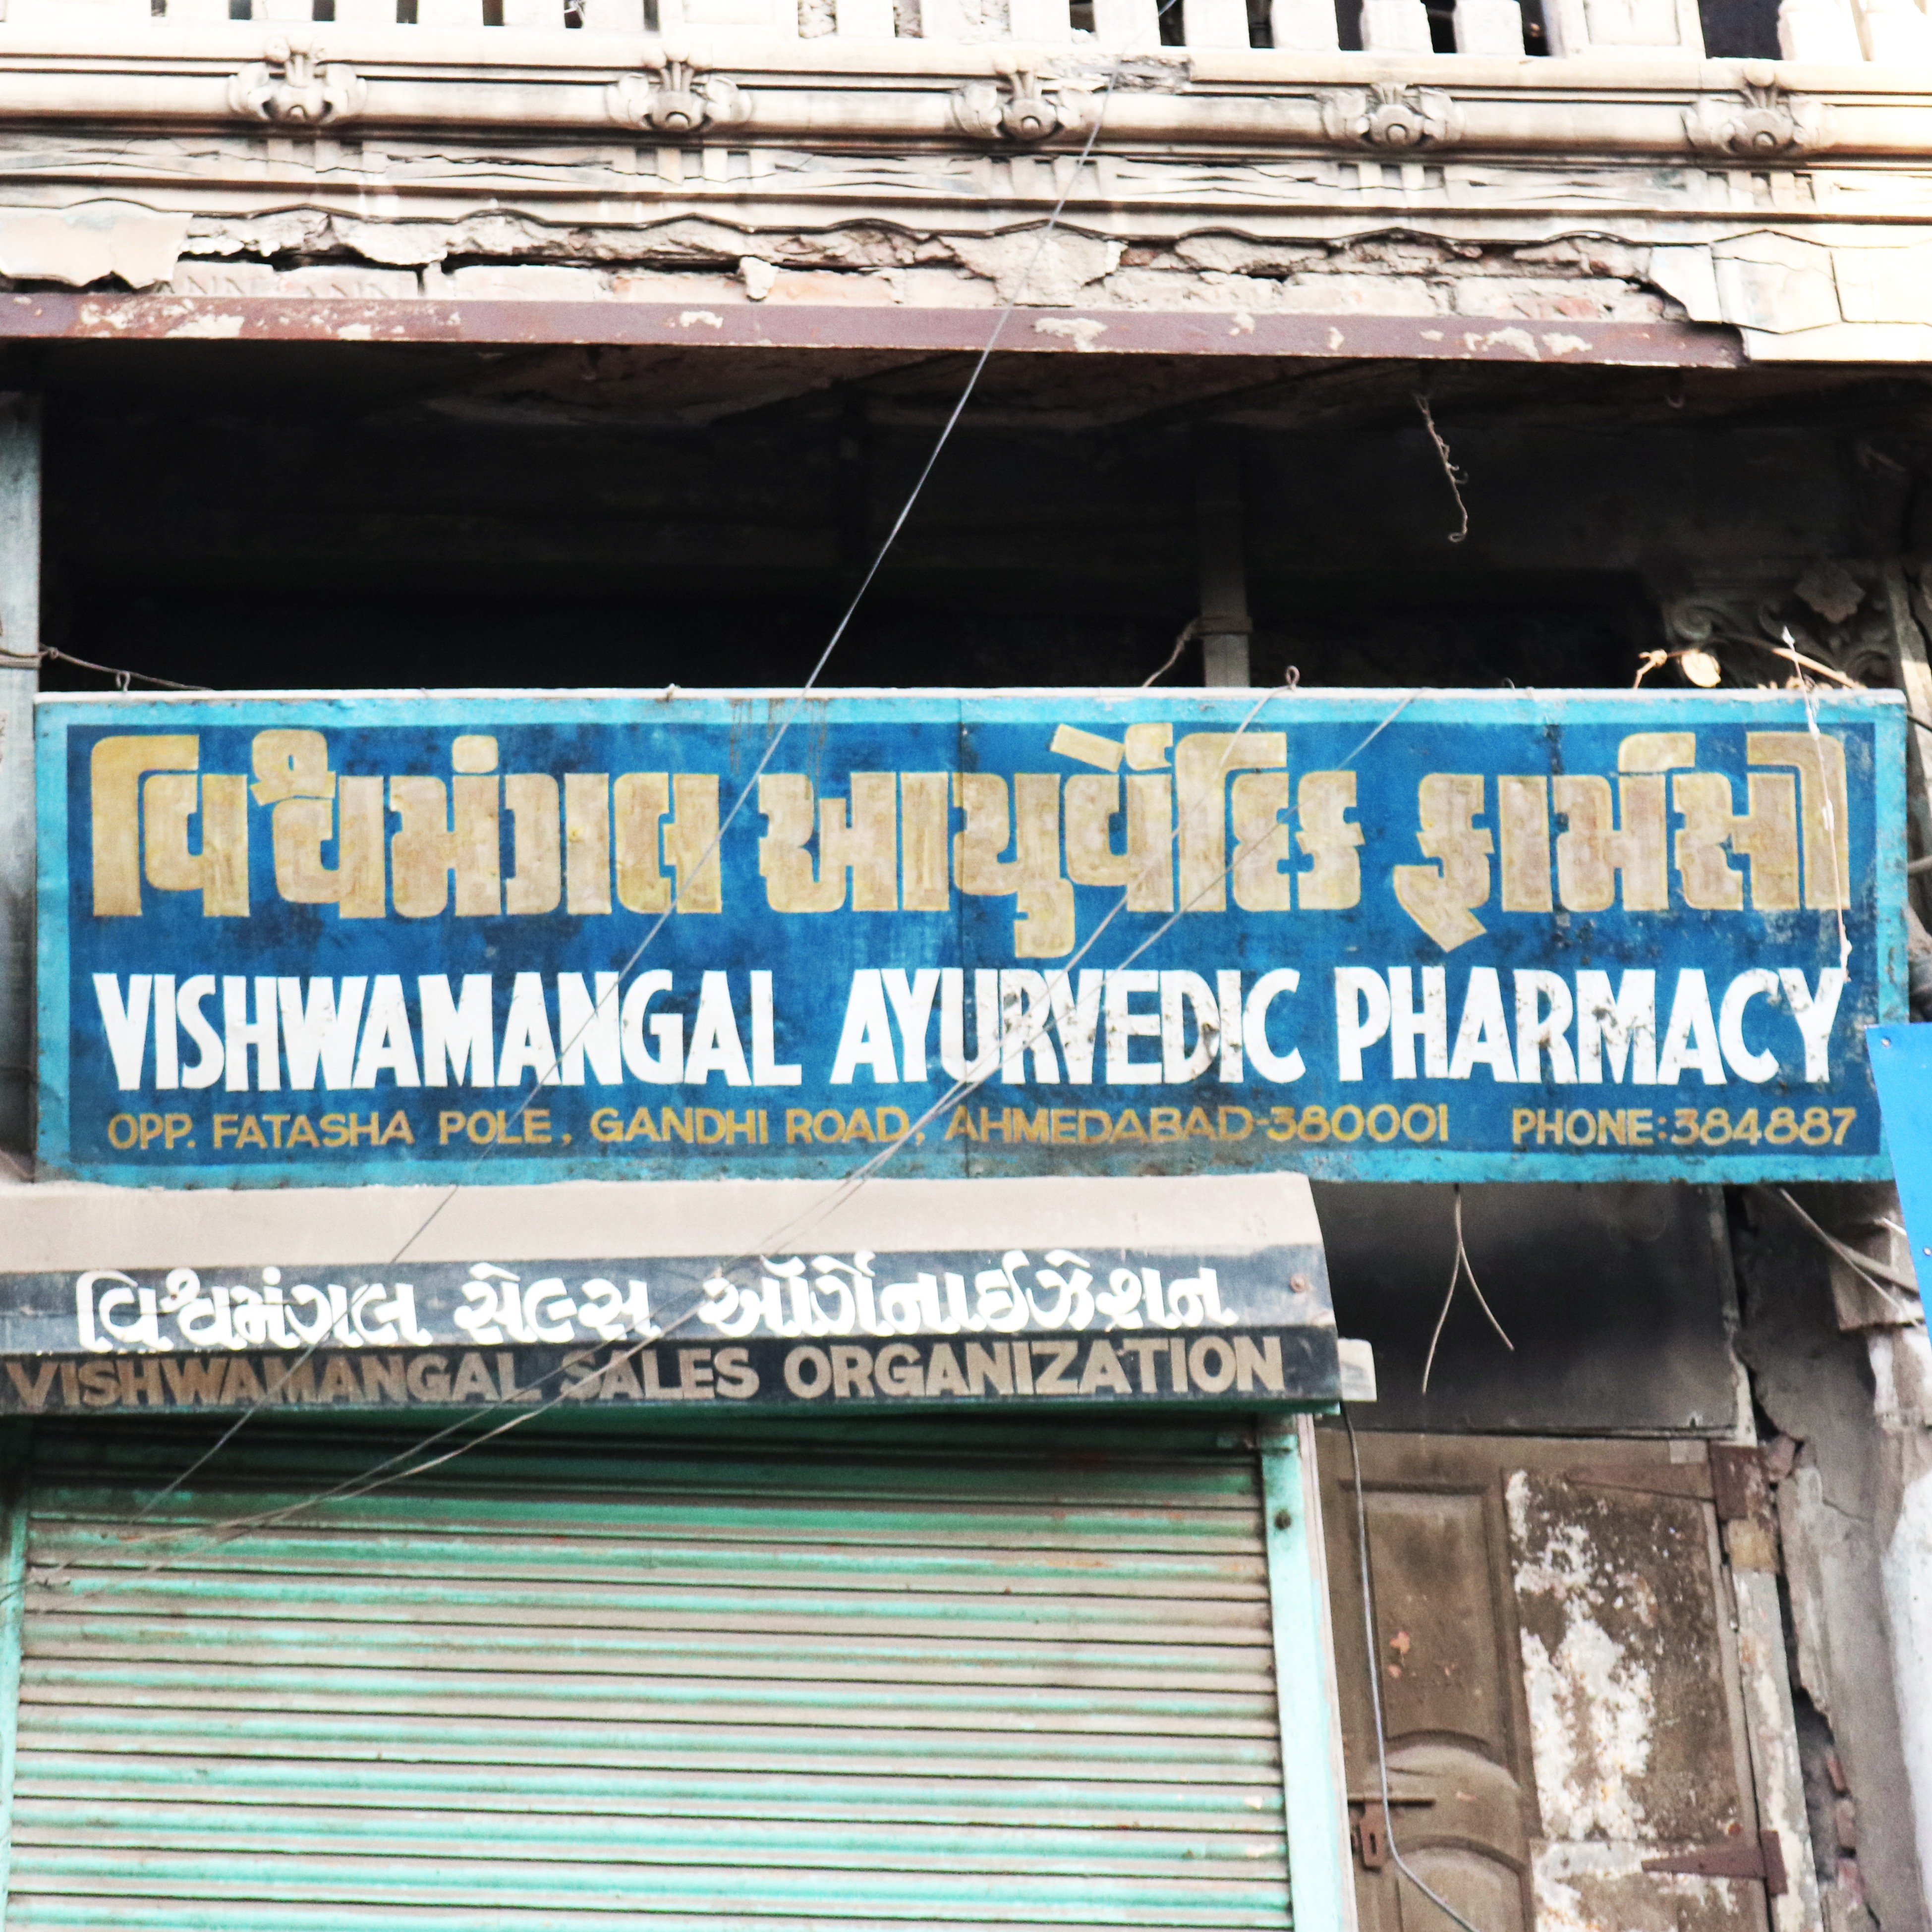 Vishwamangal Ayurvedic Pharmacy